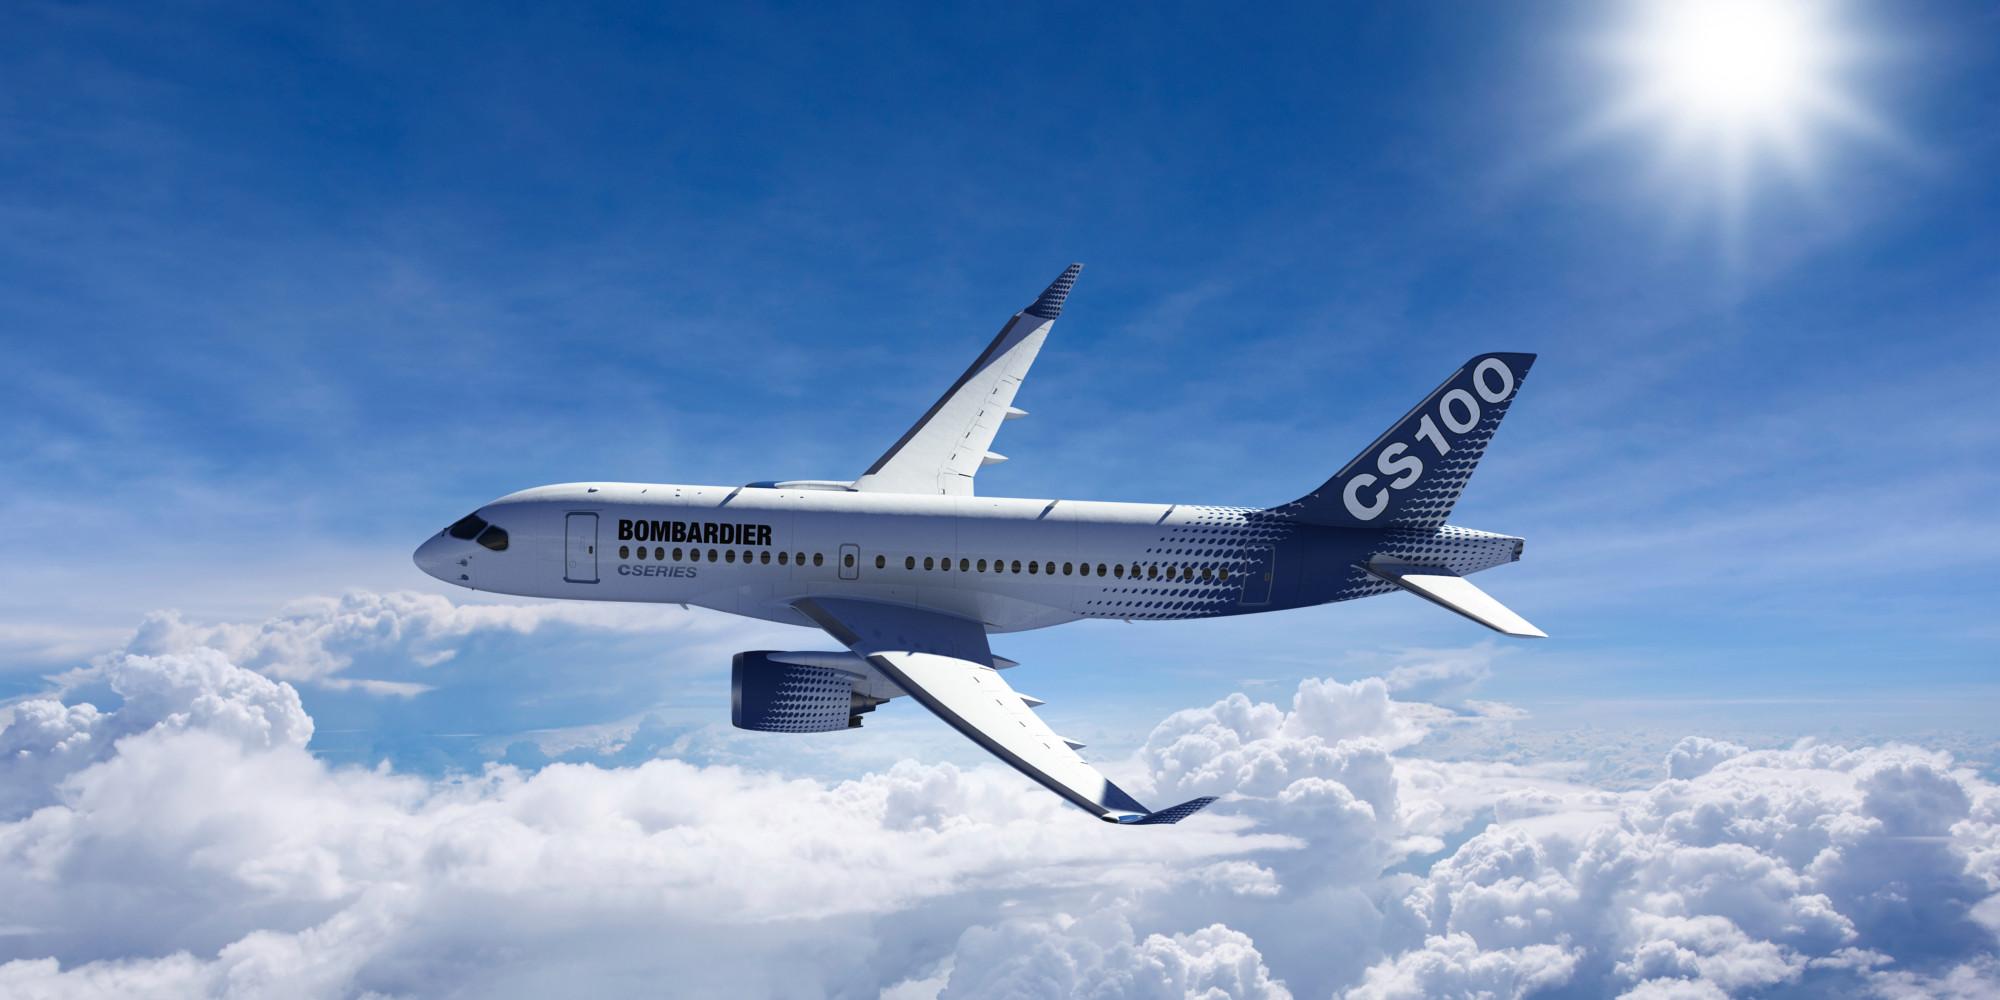 CSeries: Bombardier obtient une commande de 5,6 milliards $ de Delta Air Lines (VIDÉO)